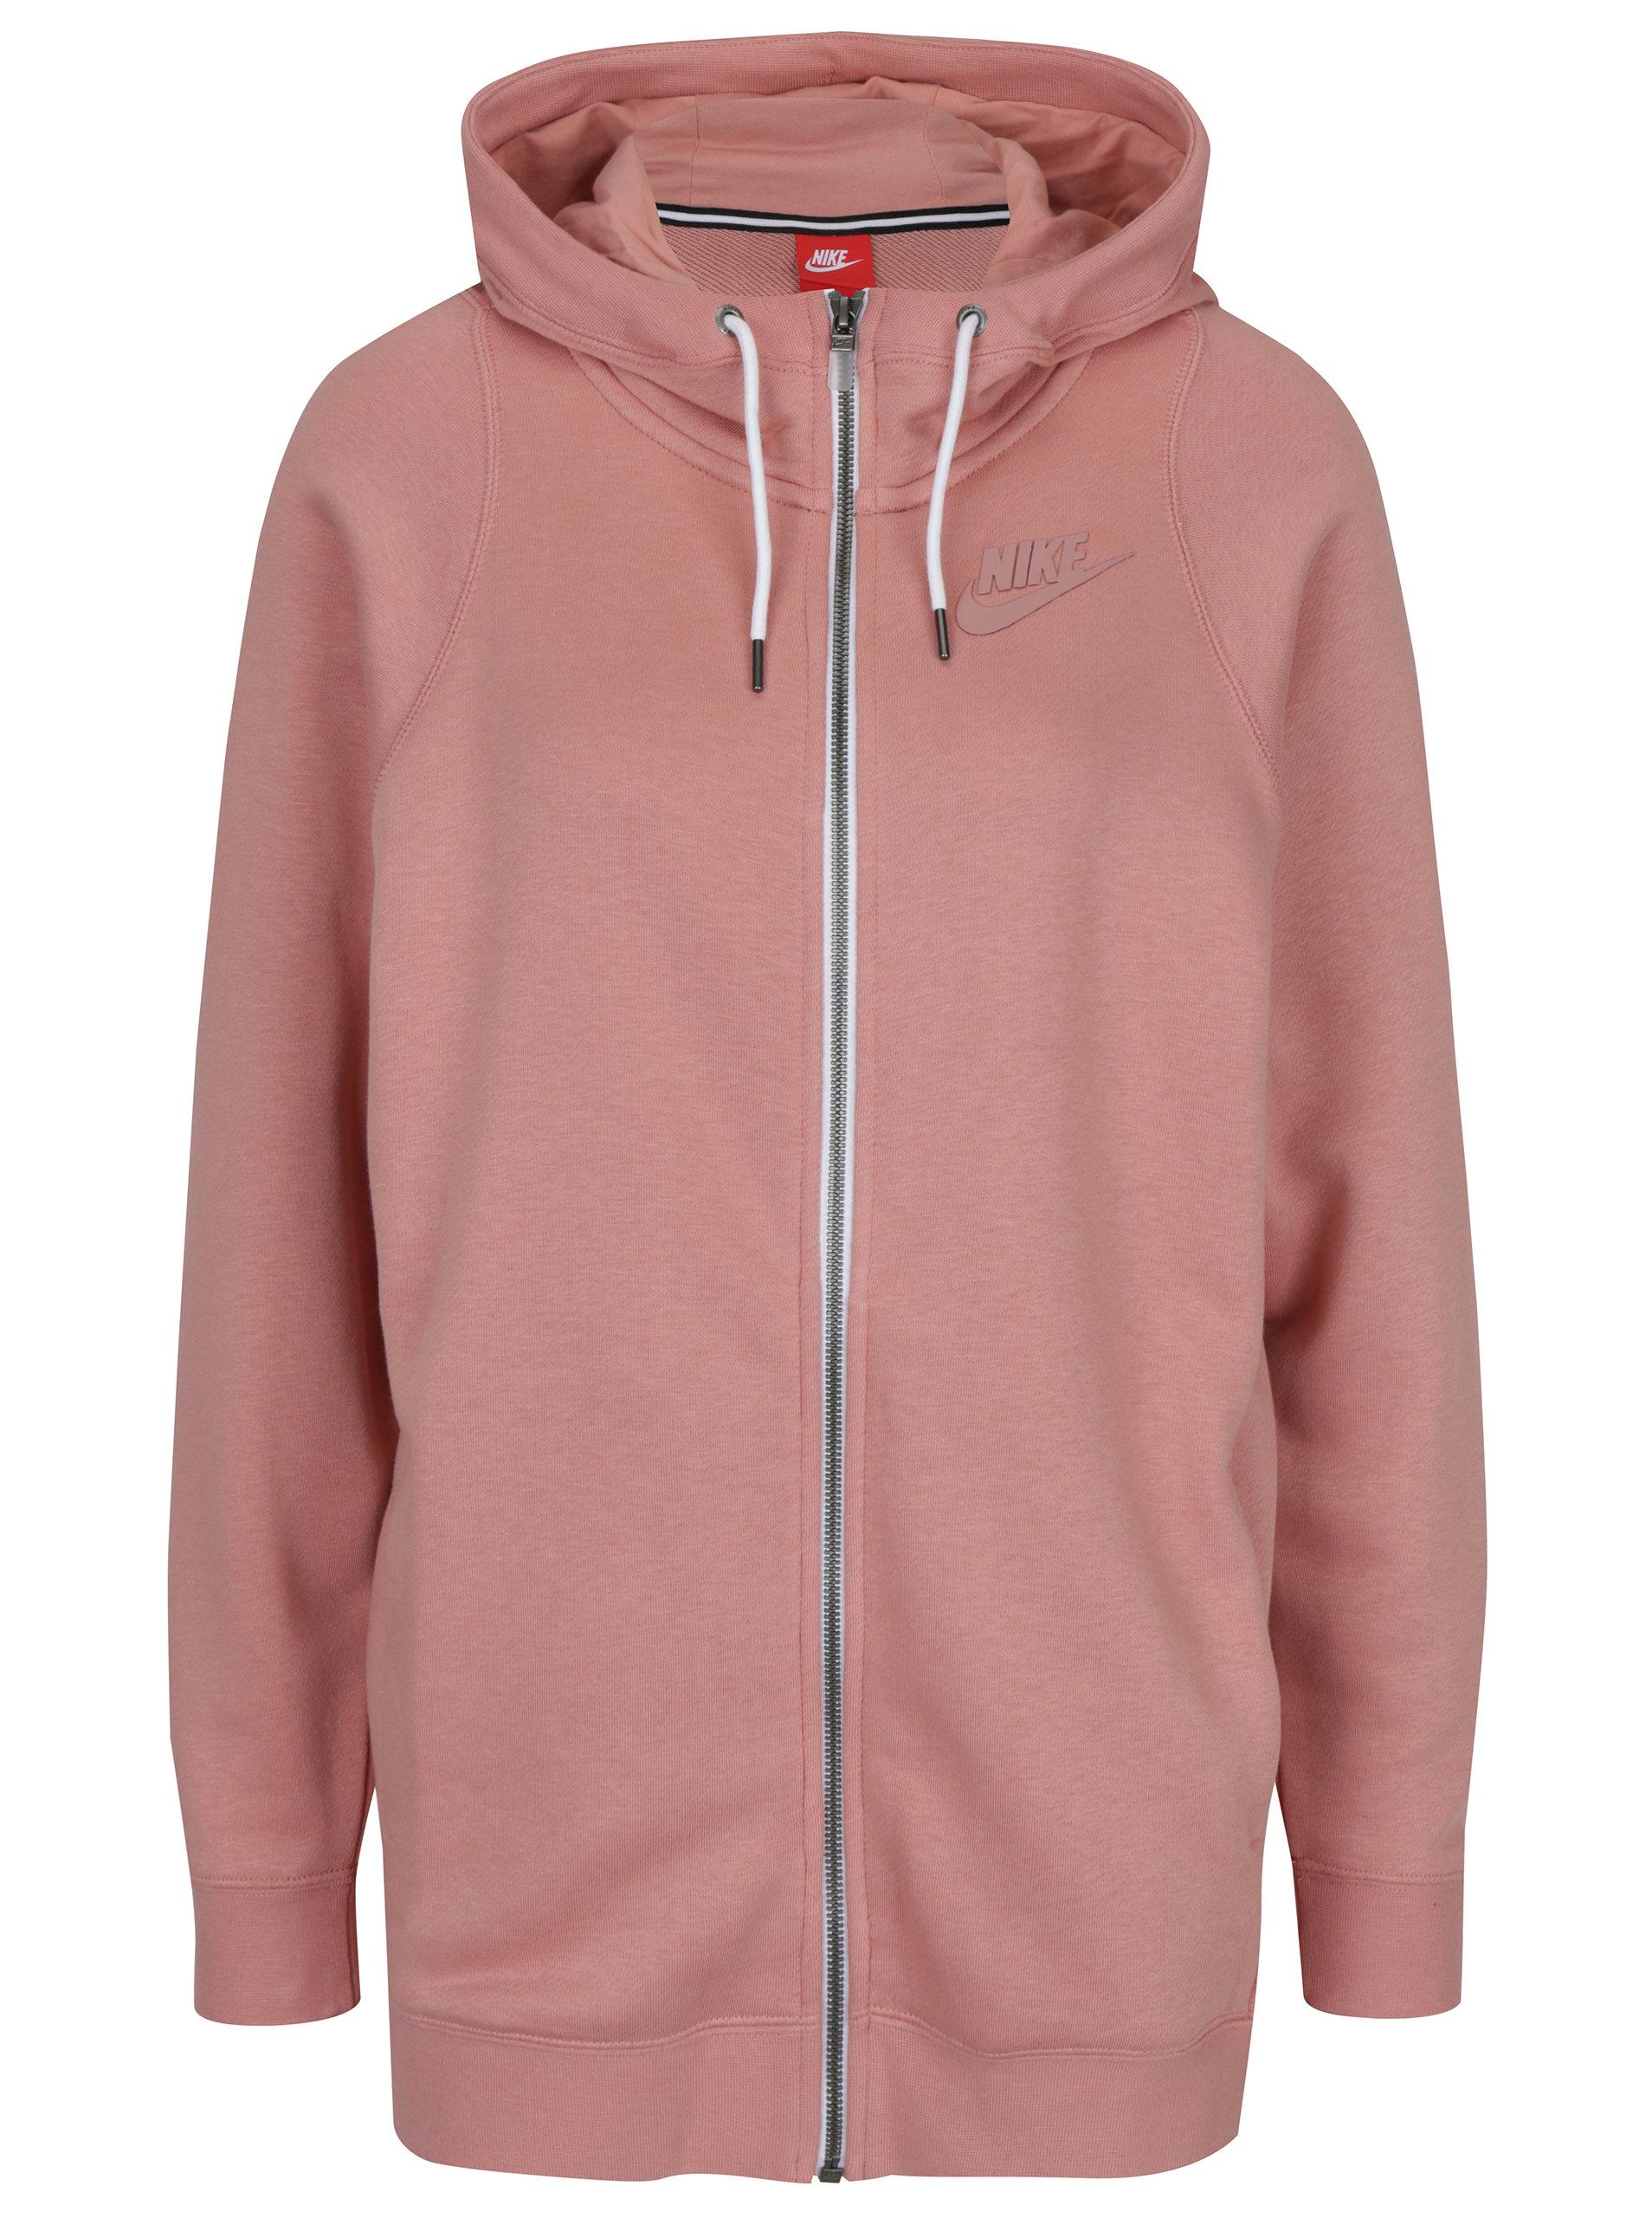 Ružová dámska mikina s kapucňou Nike Sportswear Modern ... a9f384e7c4b